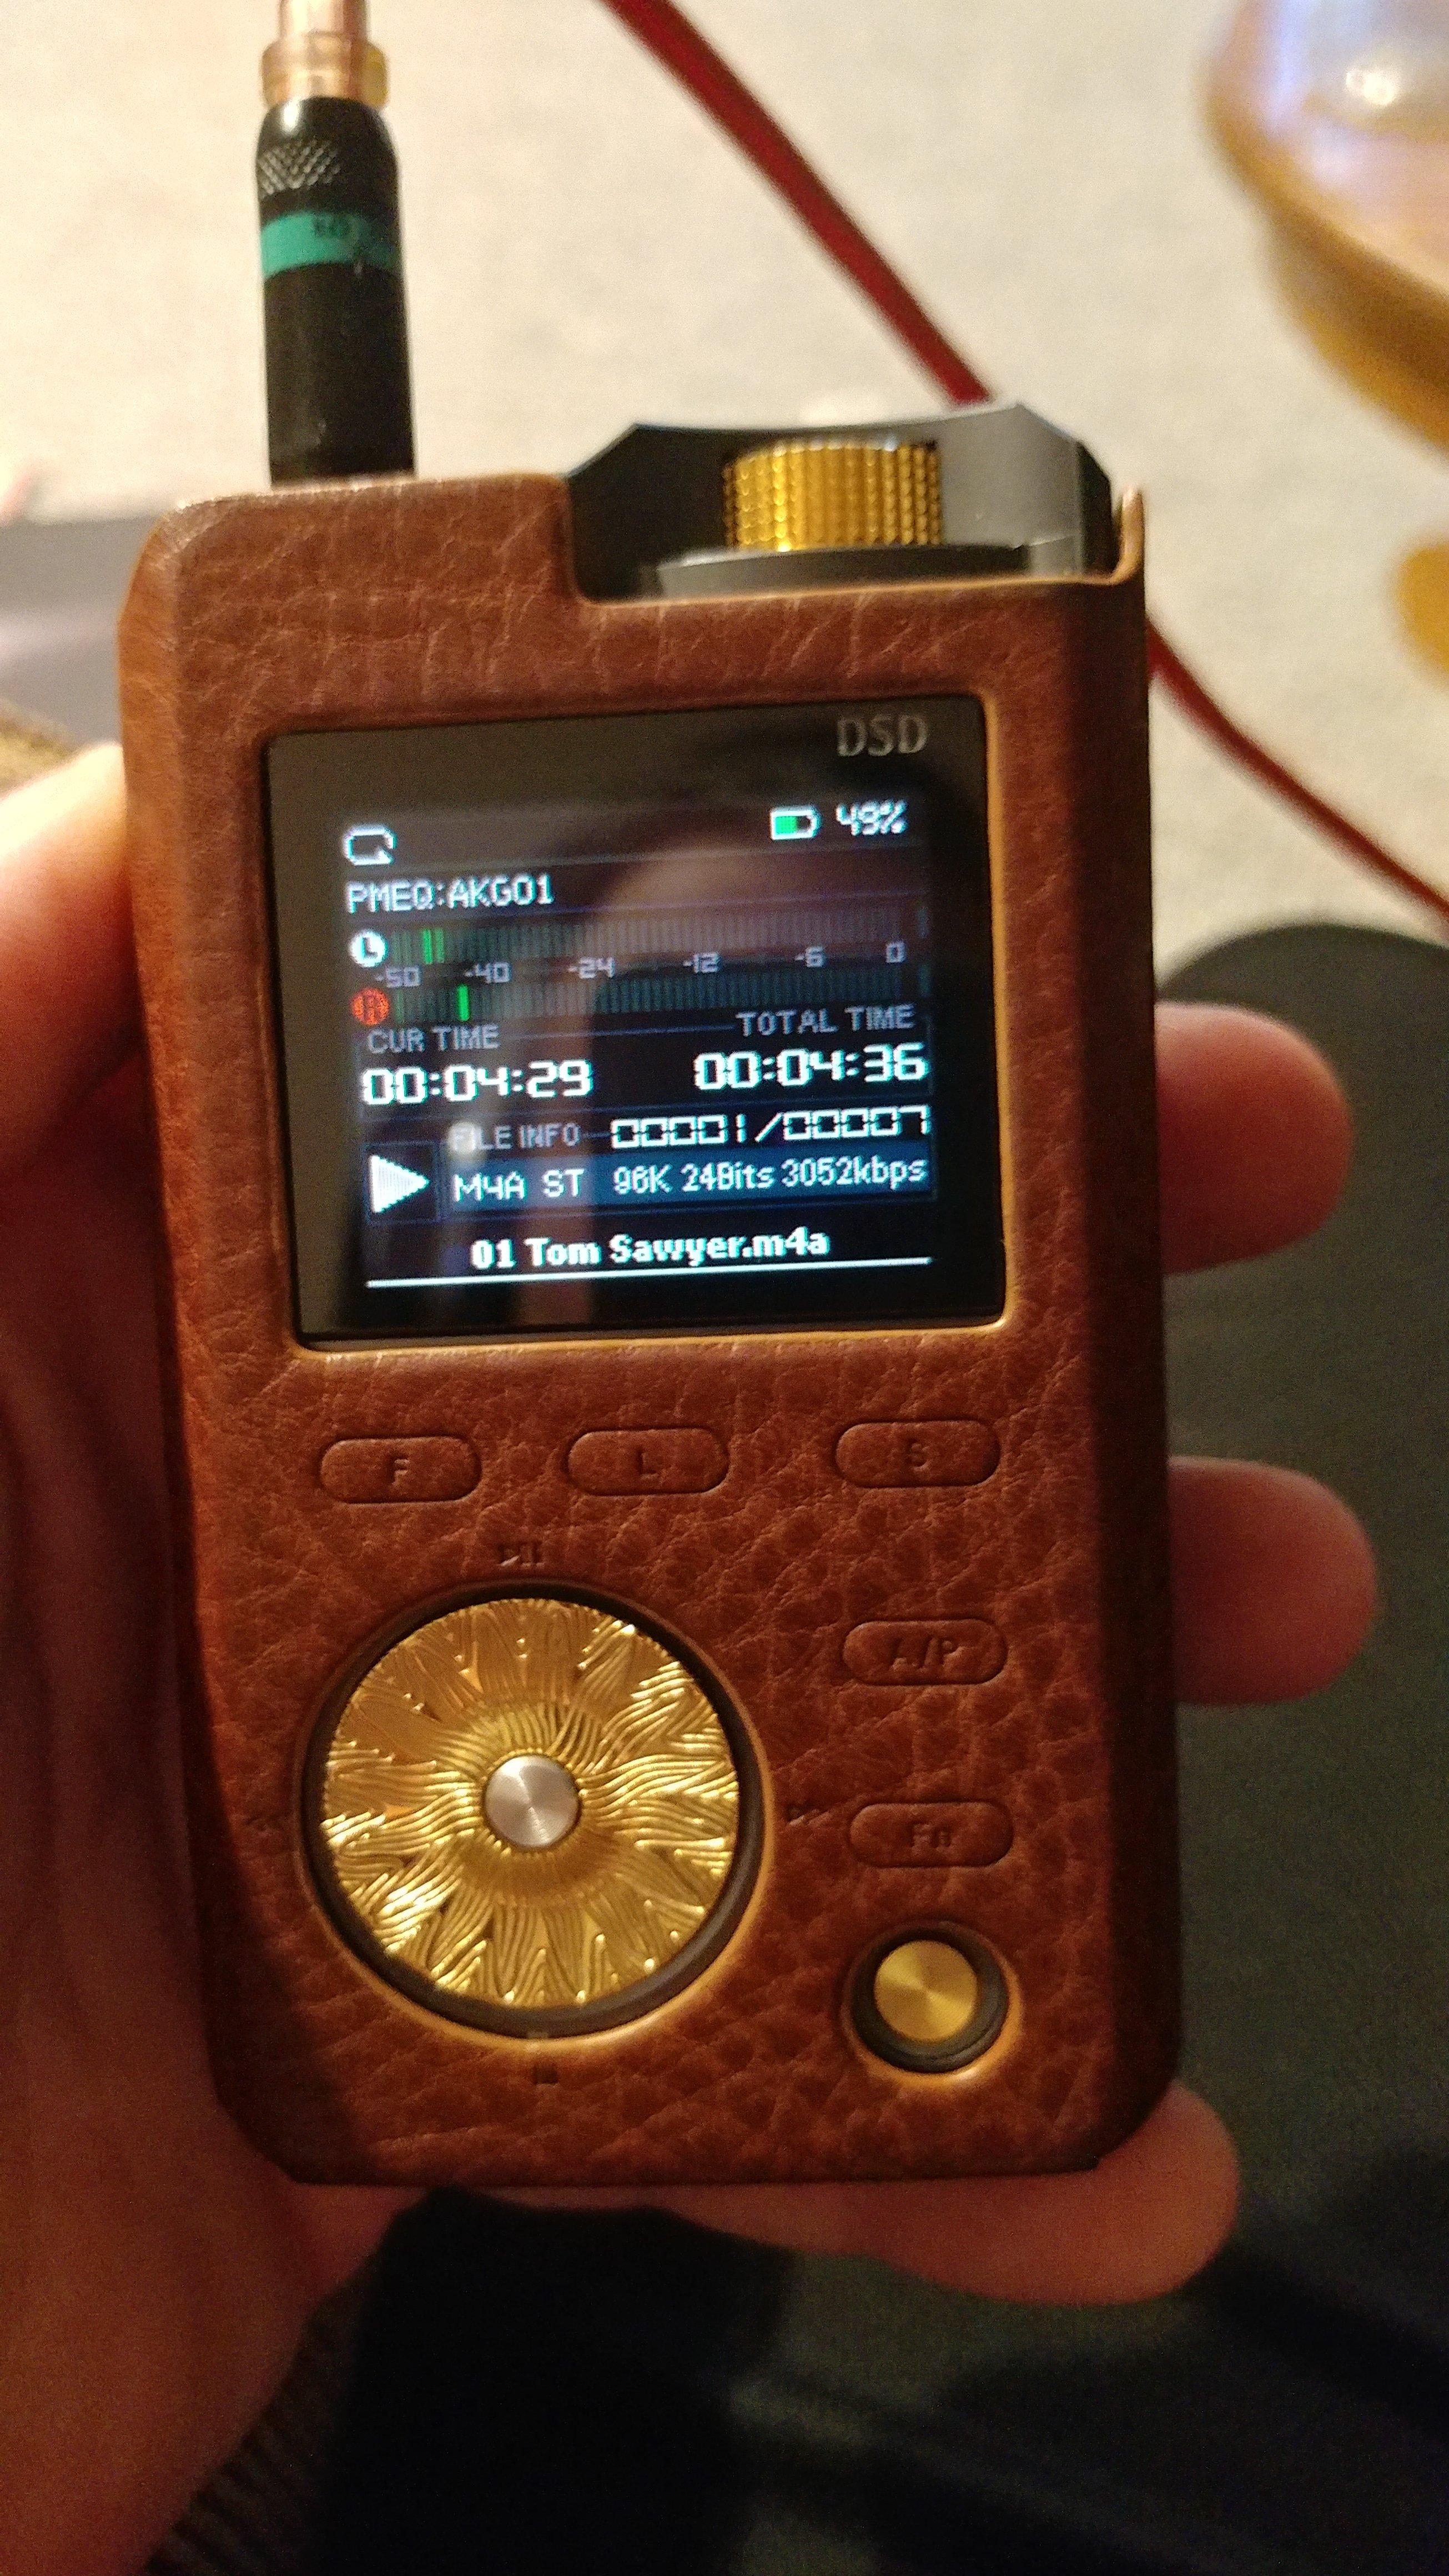 0920190809b_HDR.jpg